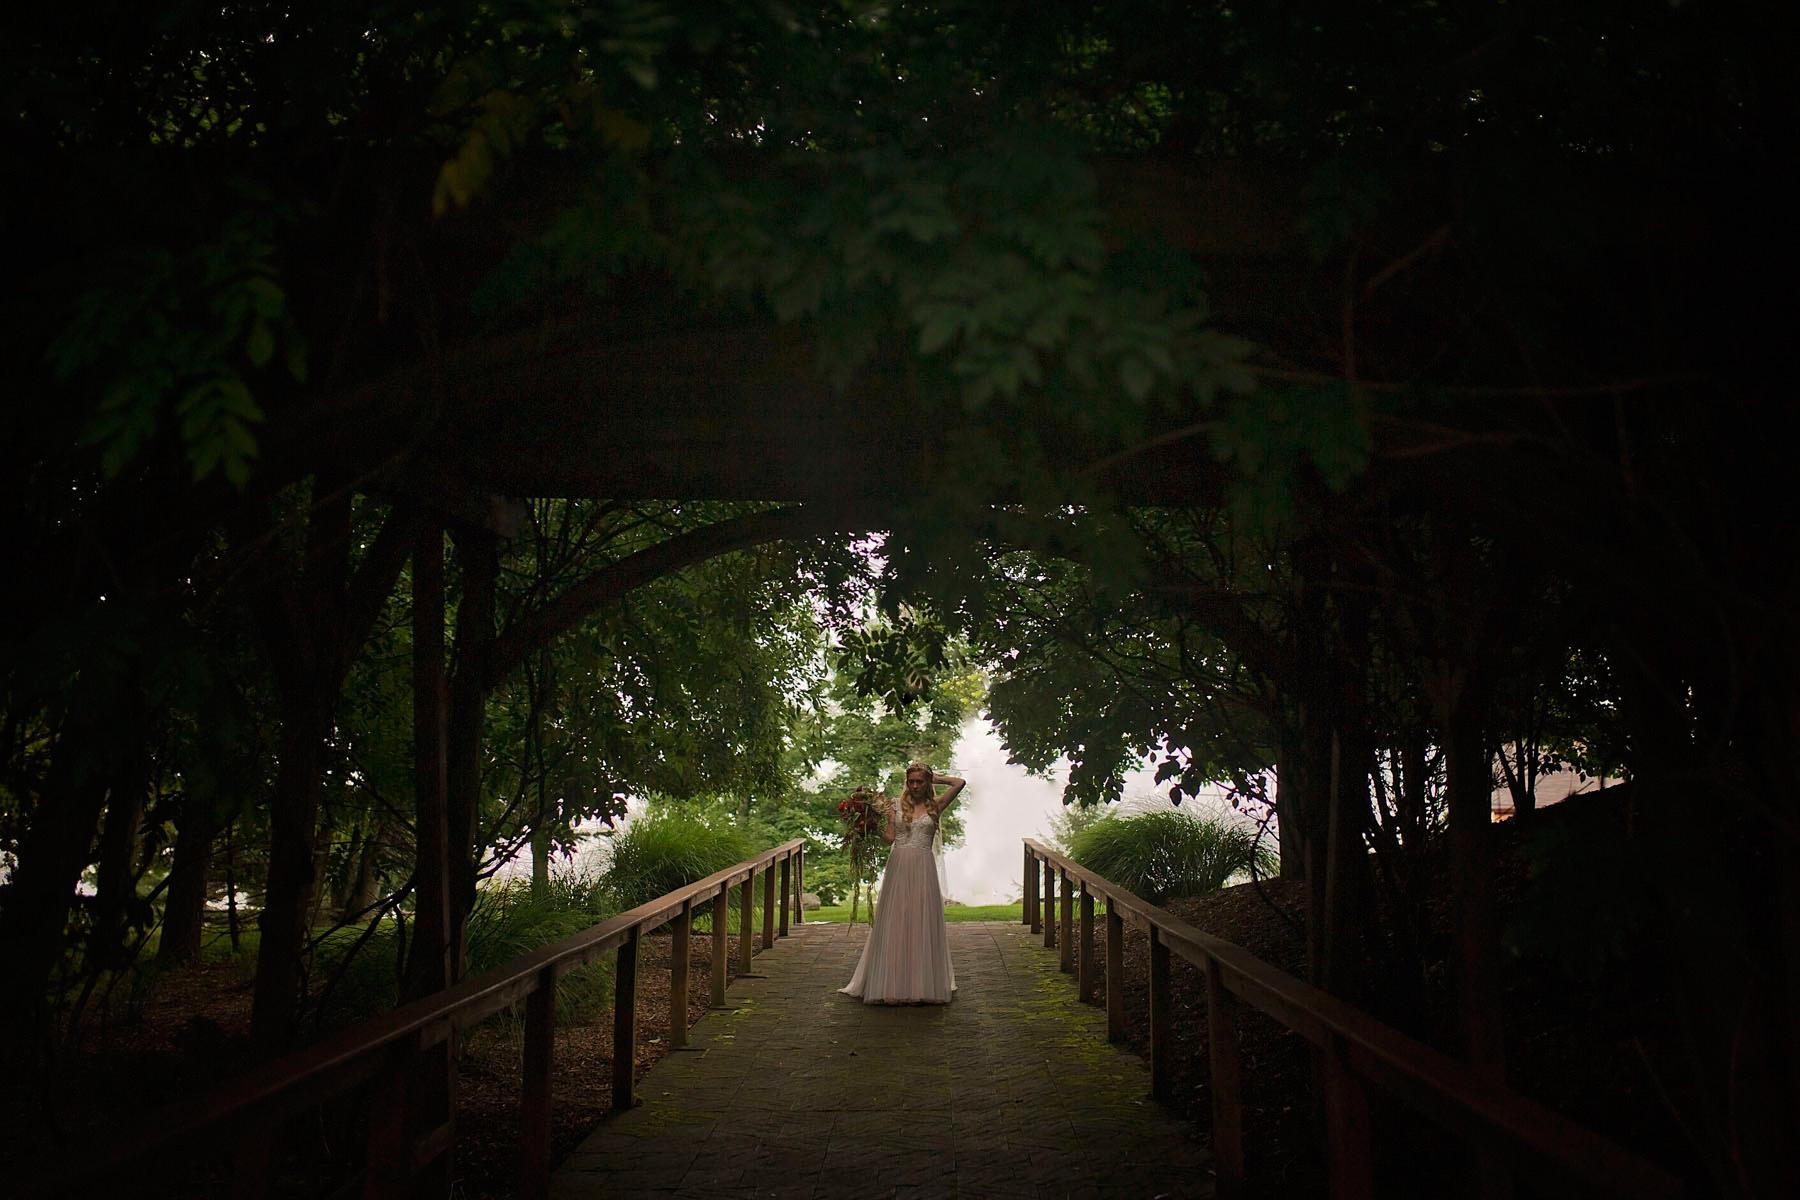 Bucks_County_wedding_photographer_Stroudsmoor_country_inn_wedding_Philadelphia_wedding_photographer_05_fairy_inspired_bride.JPG